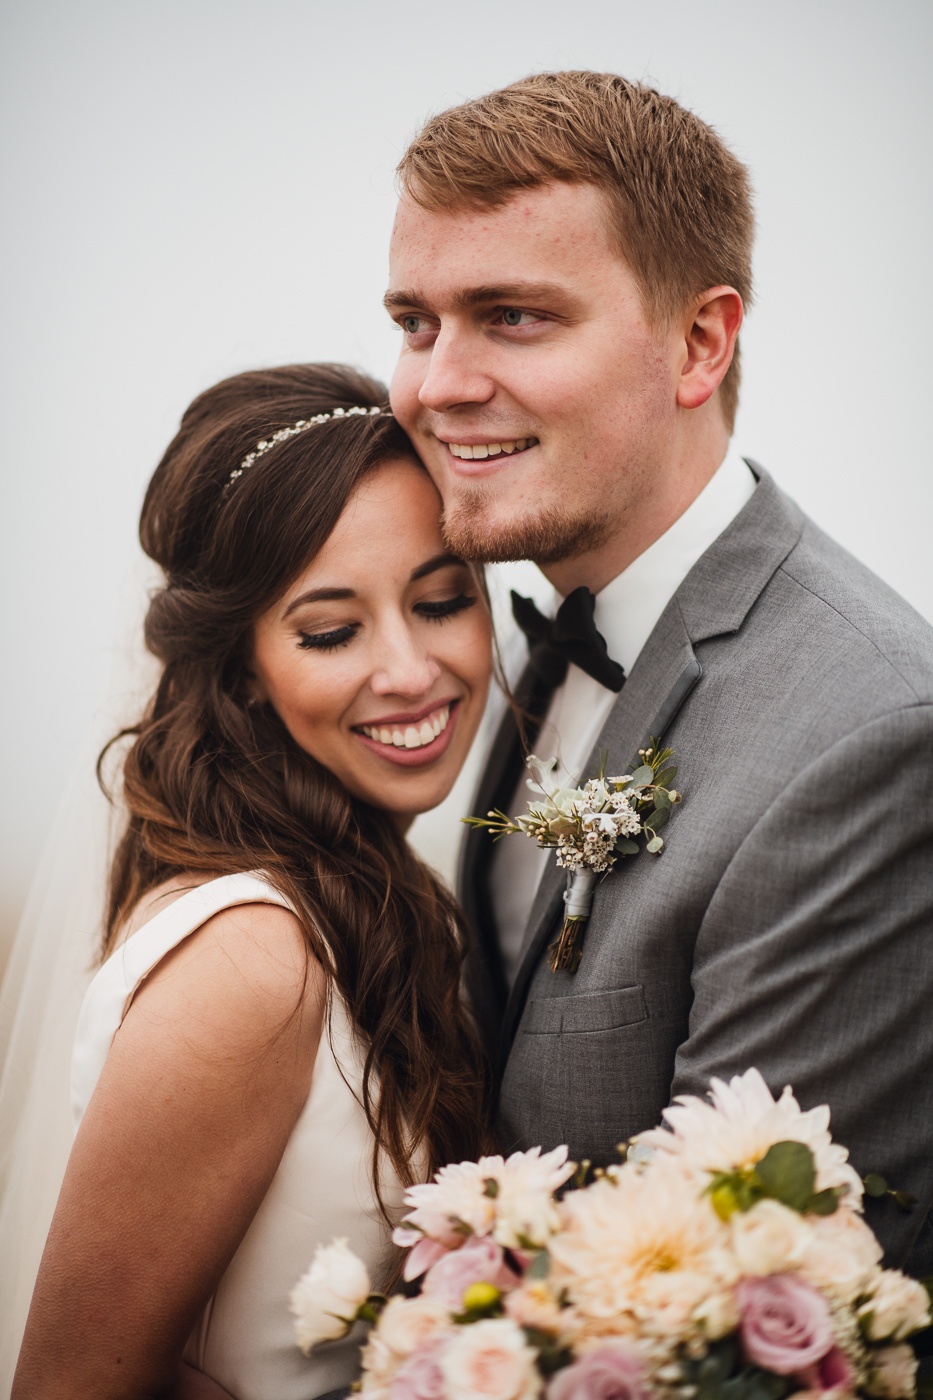 Candice Rawlin Wedding PHOCO Photography Pines Genesee Golden Colorado Fog -24.jpg